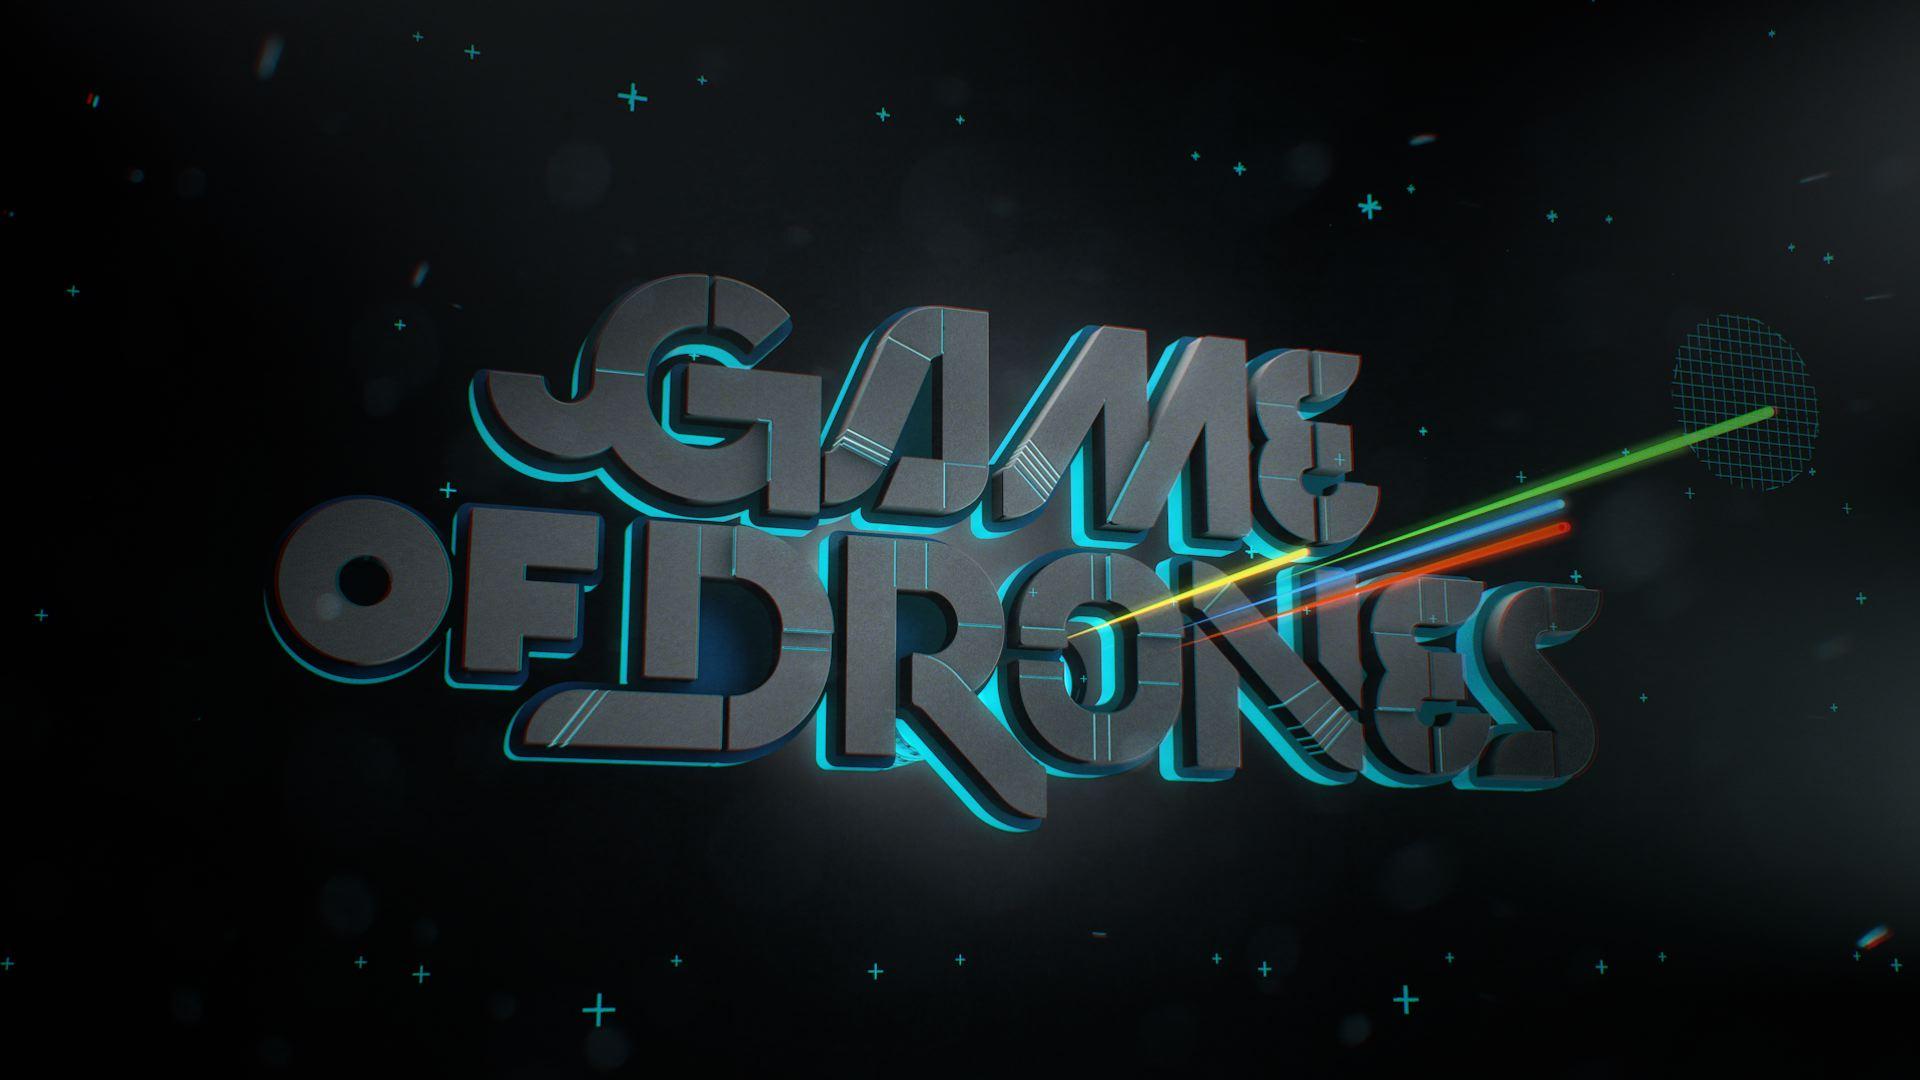 BesteShow_GameOfDrones.JPG